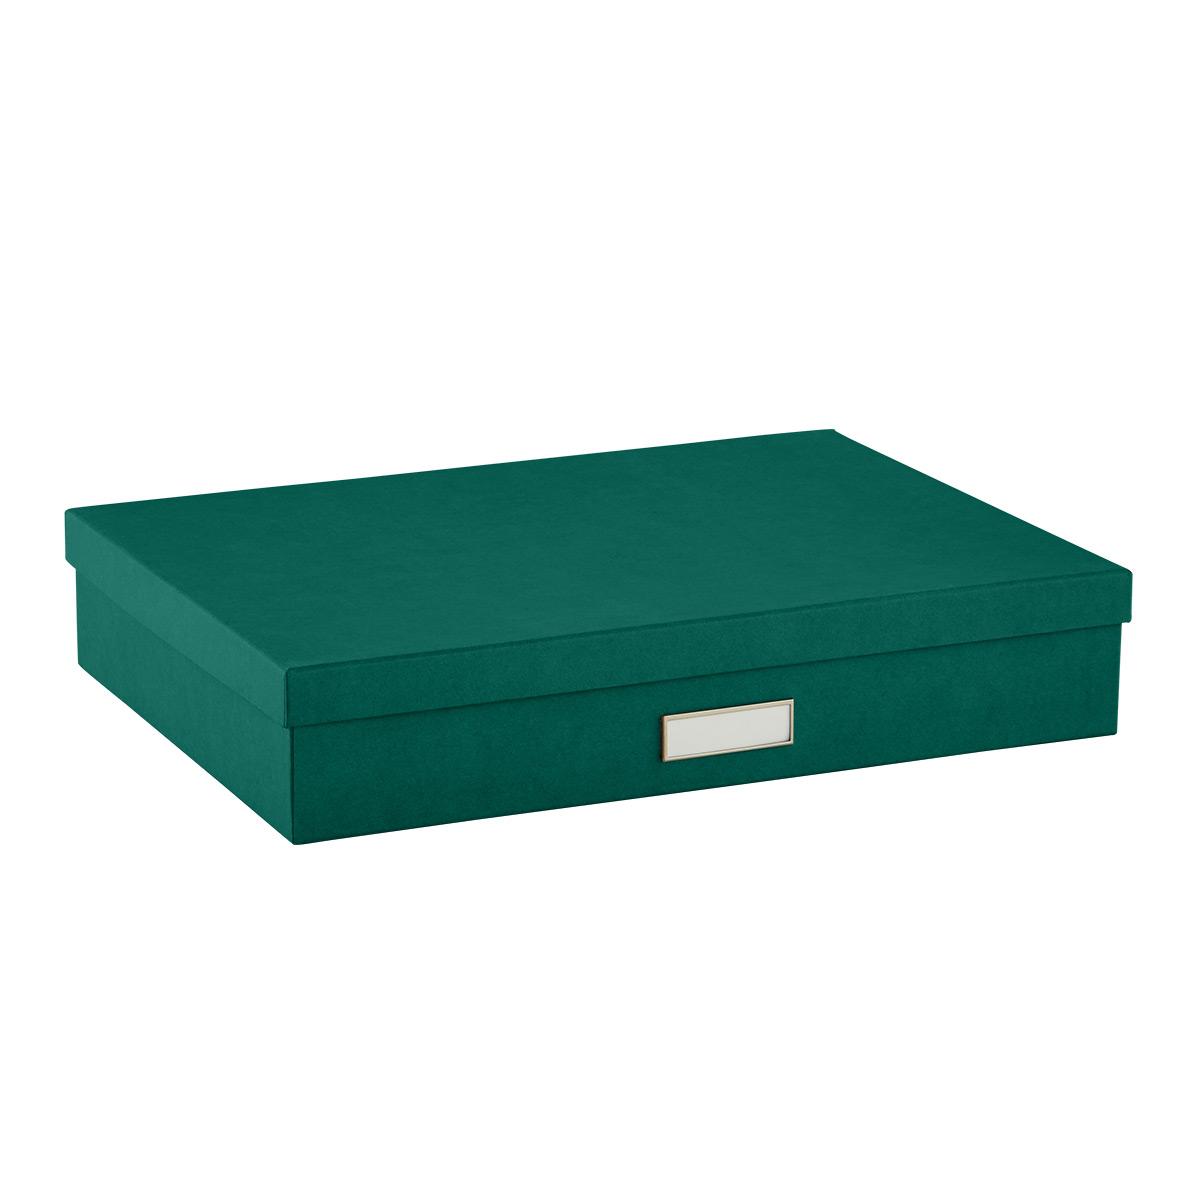 Stockholm Document Box